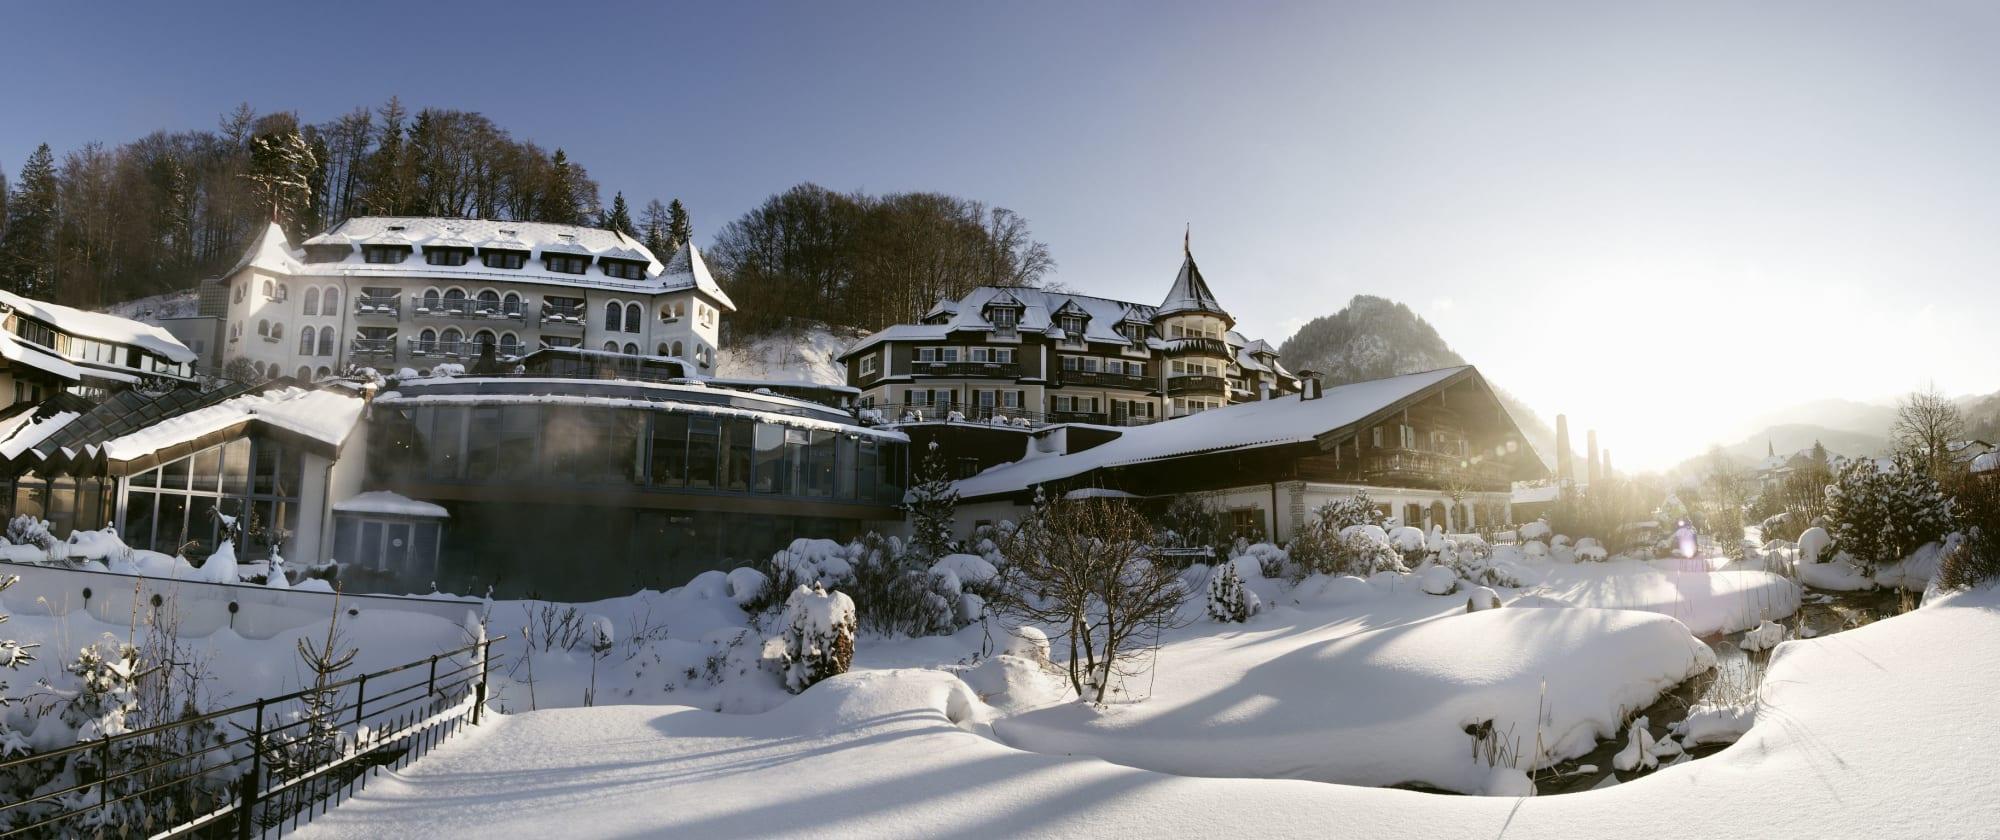 Hotel Hotel Ebner S Waldhof Am See Fuschl Am See Trivago Com